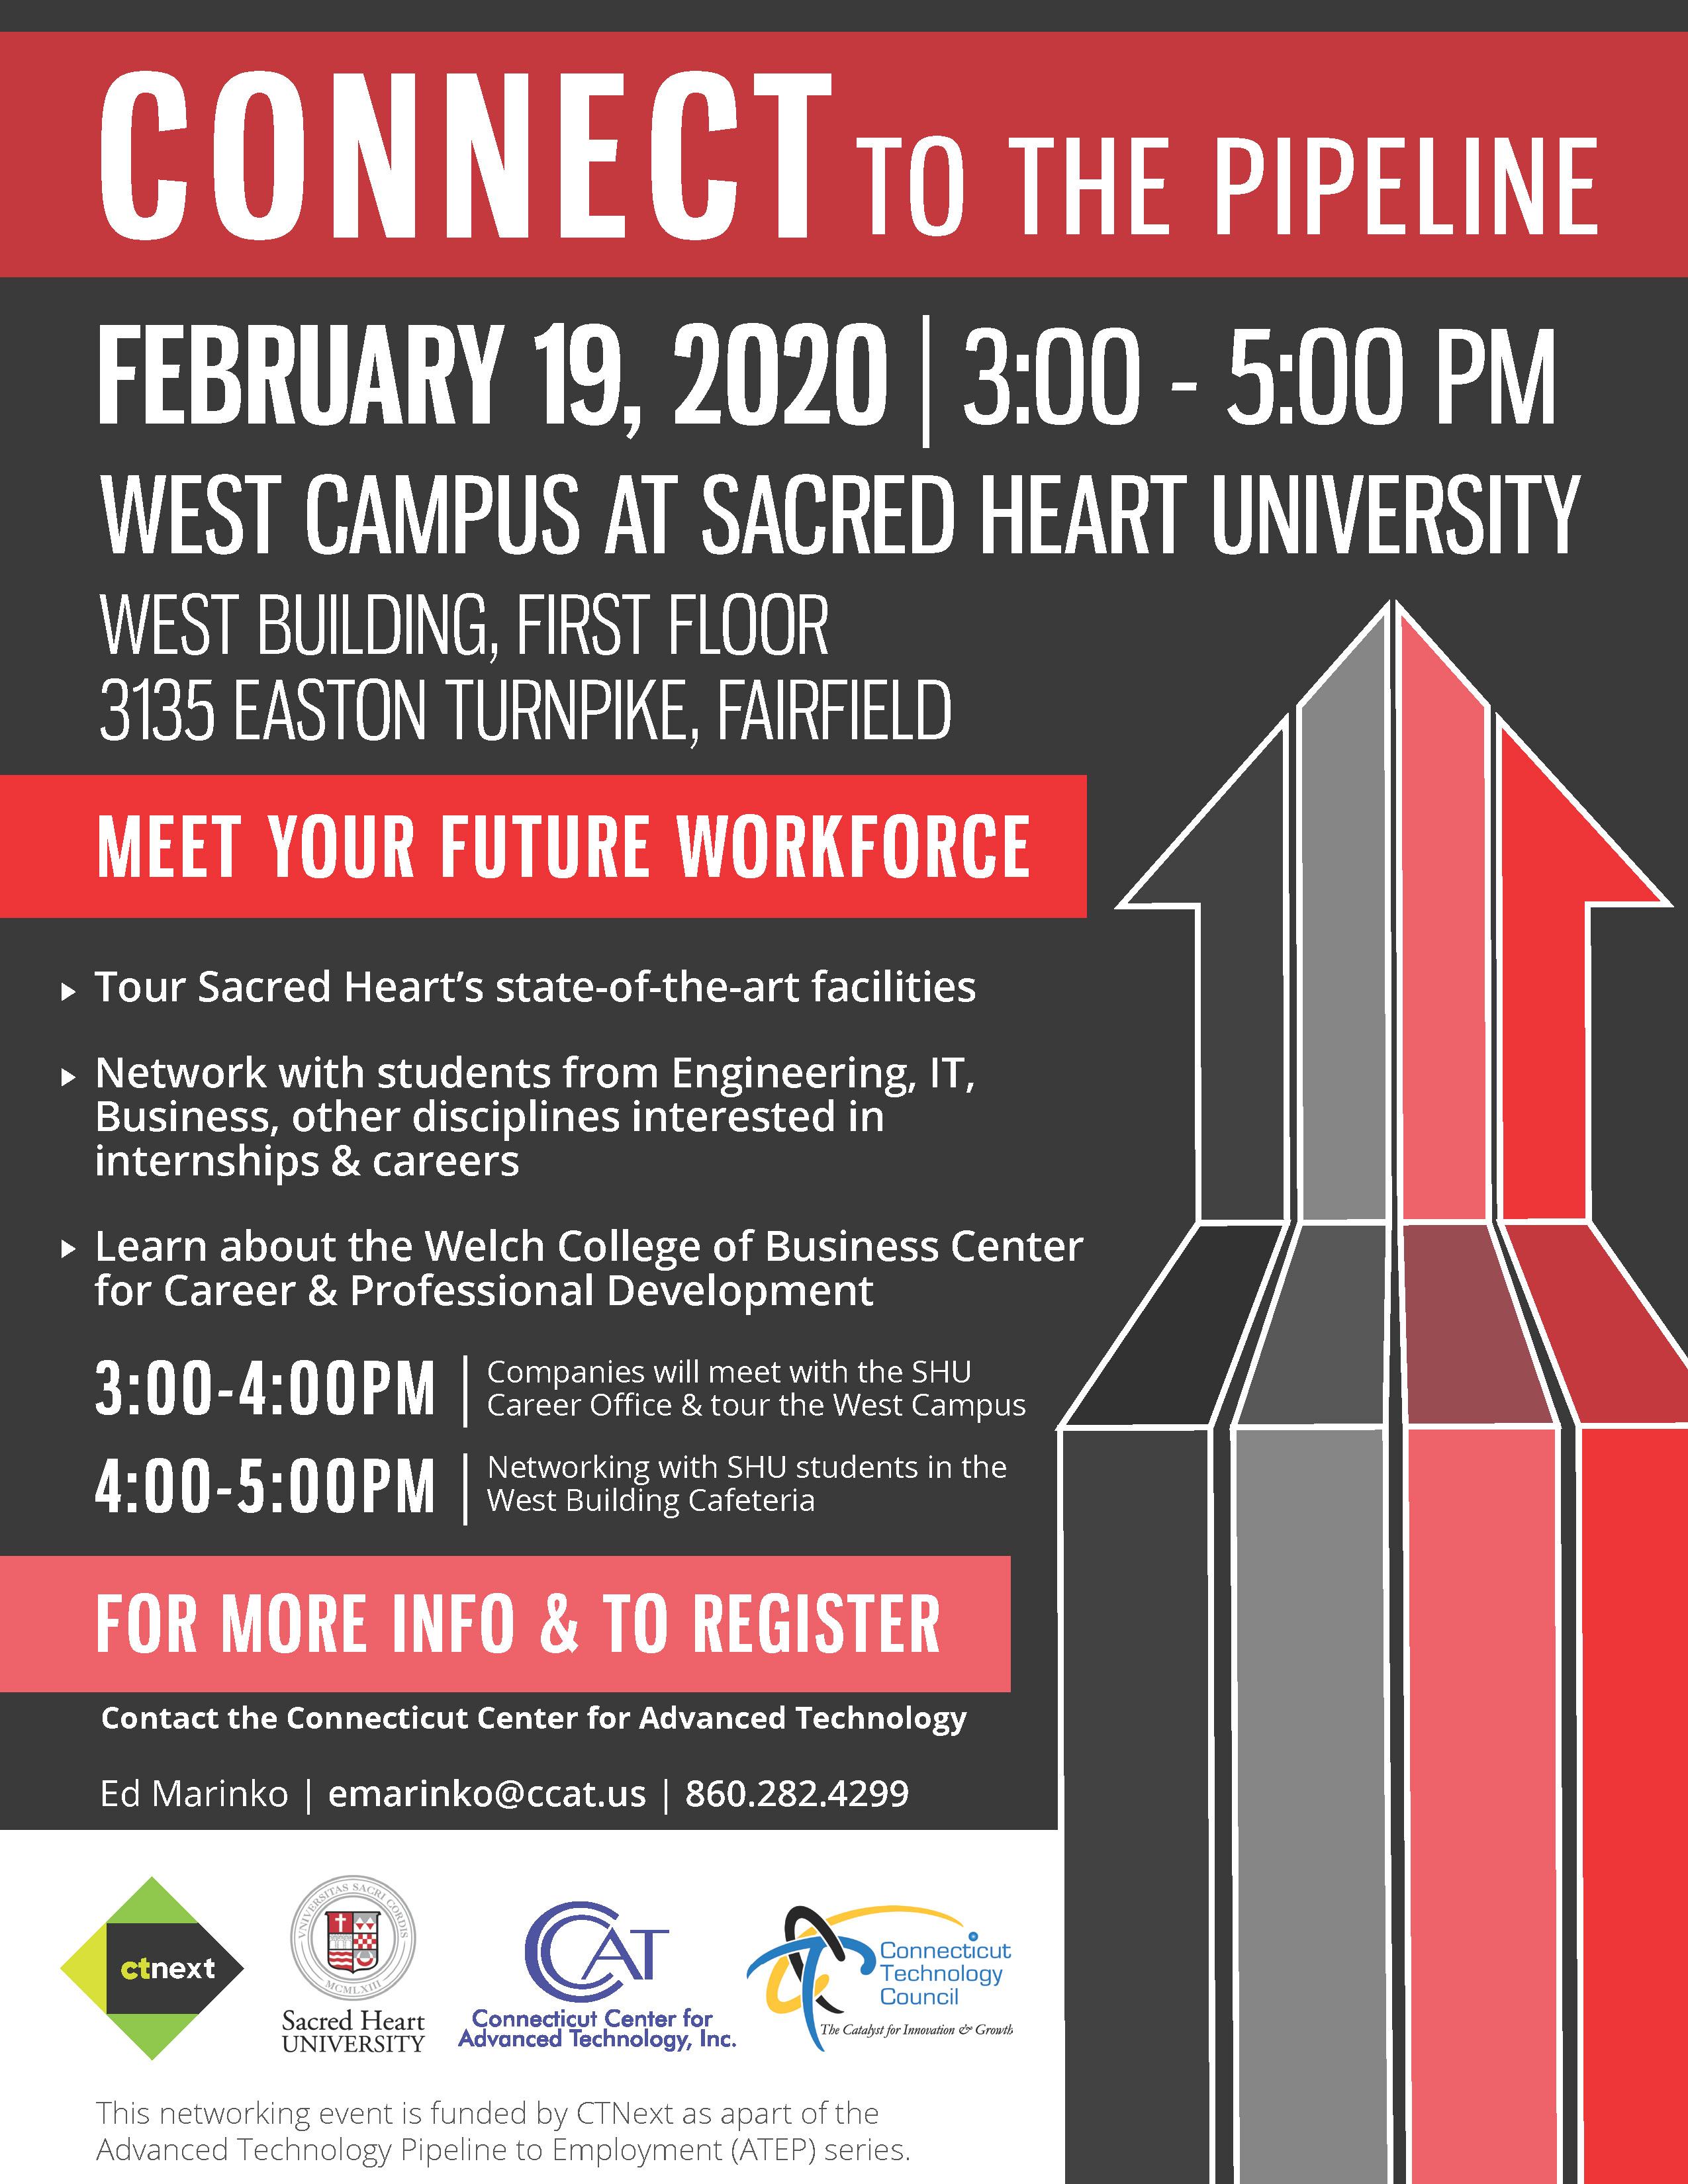 Meet your Future Workforce at Sacred Heart University Feb. 19, 2020